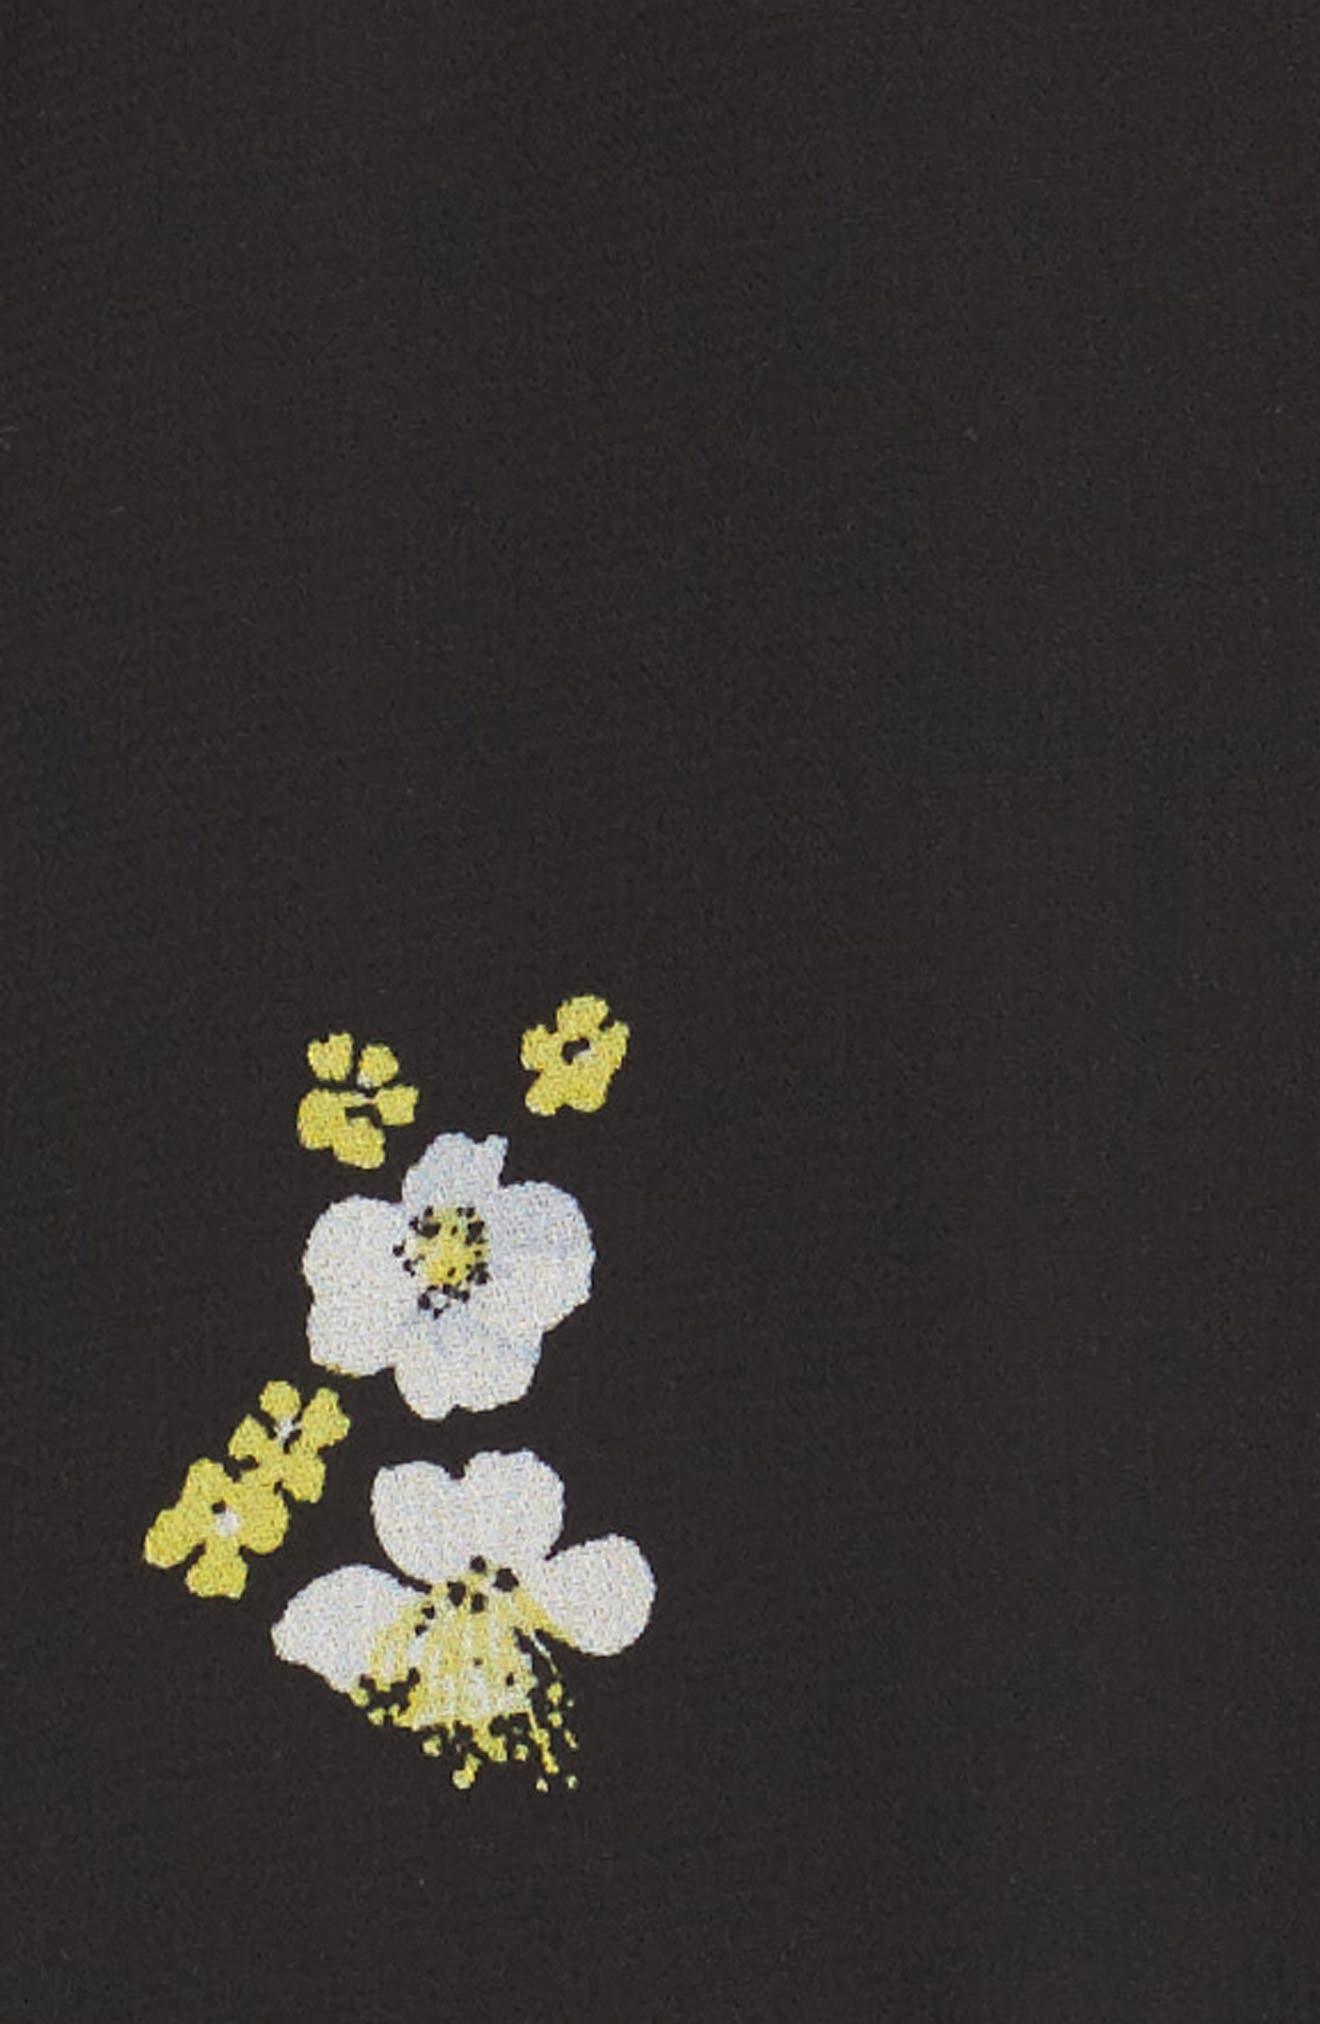 Ditzy Floral & Ruffle Chiffon Dress,                             Alternate thumbnail 6, color,                             001